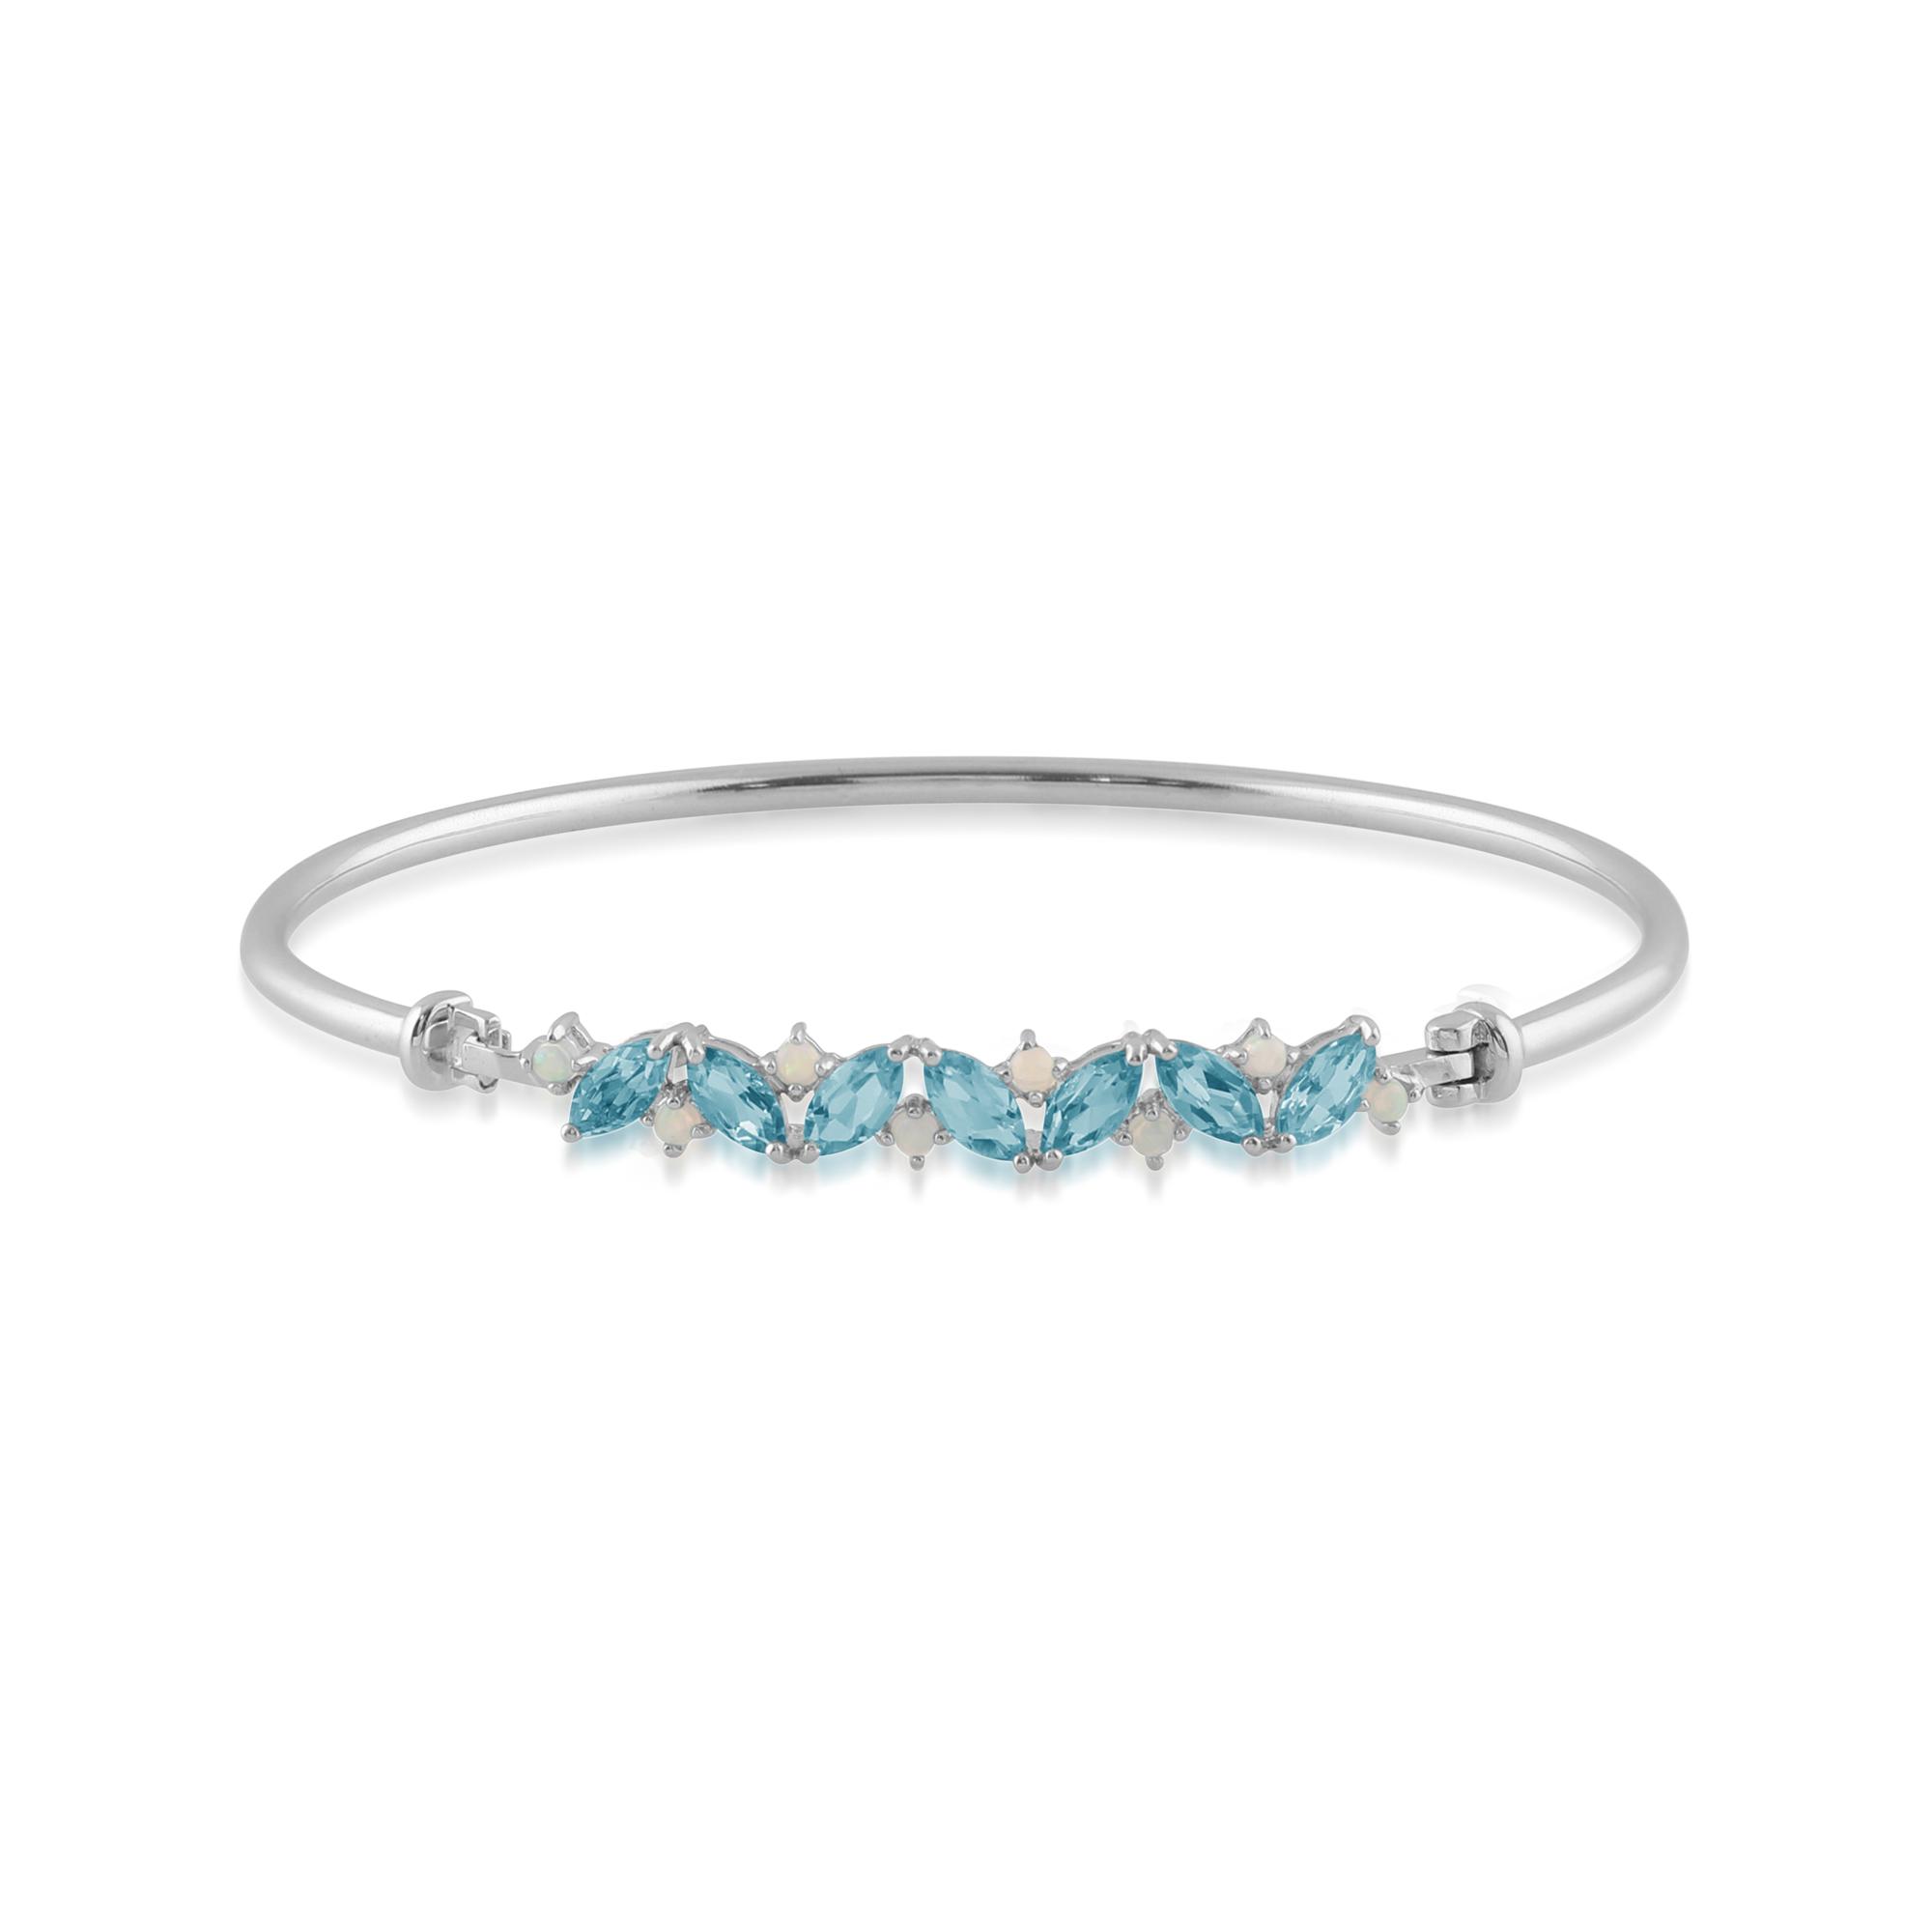 Opal & Topaz Cluster 925 Sterling Silver Bangle